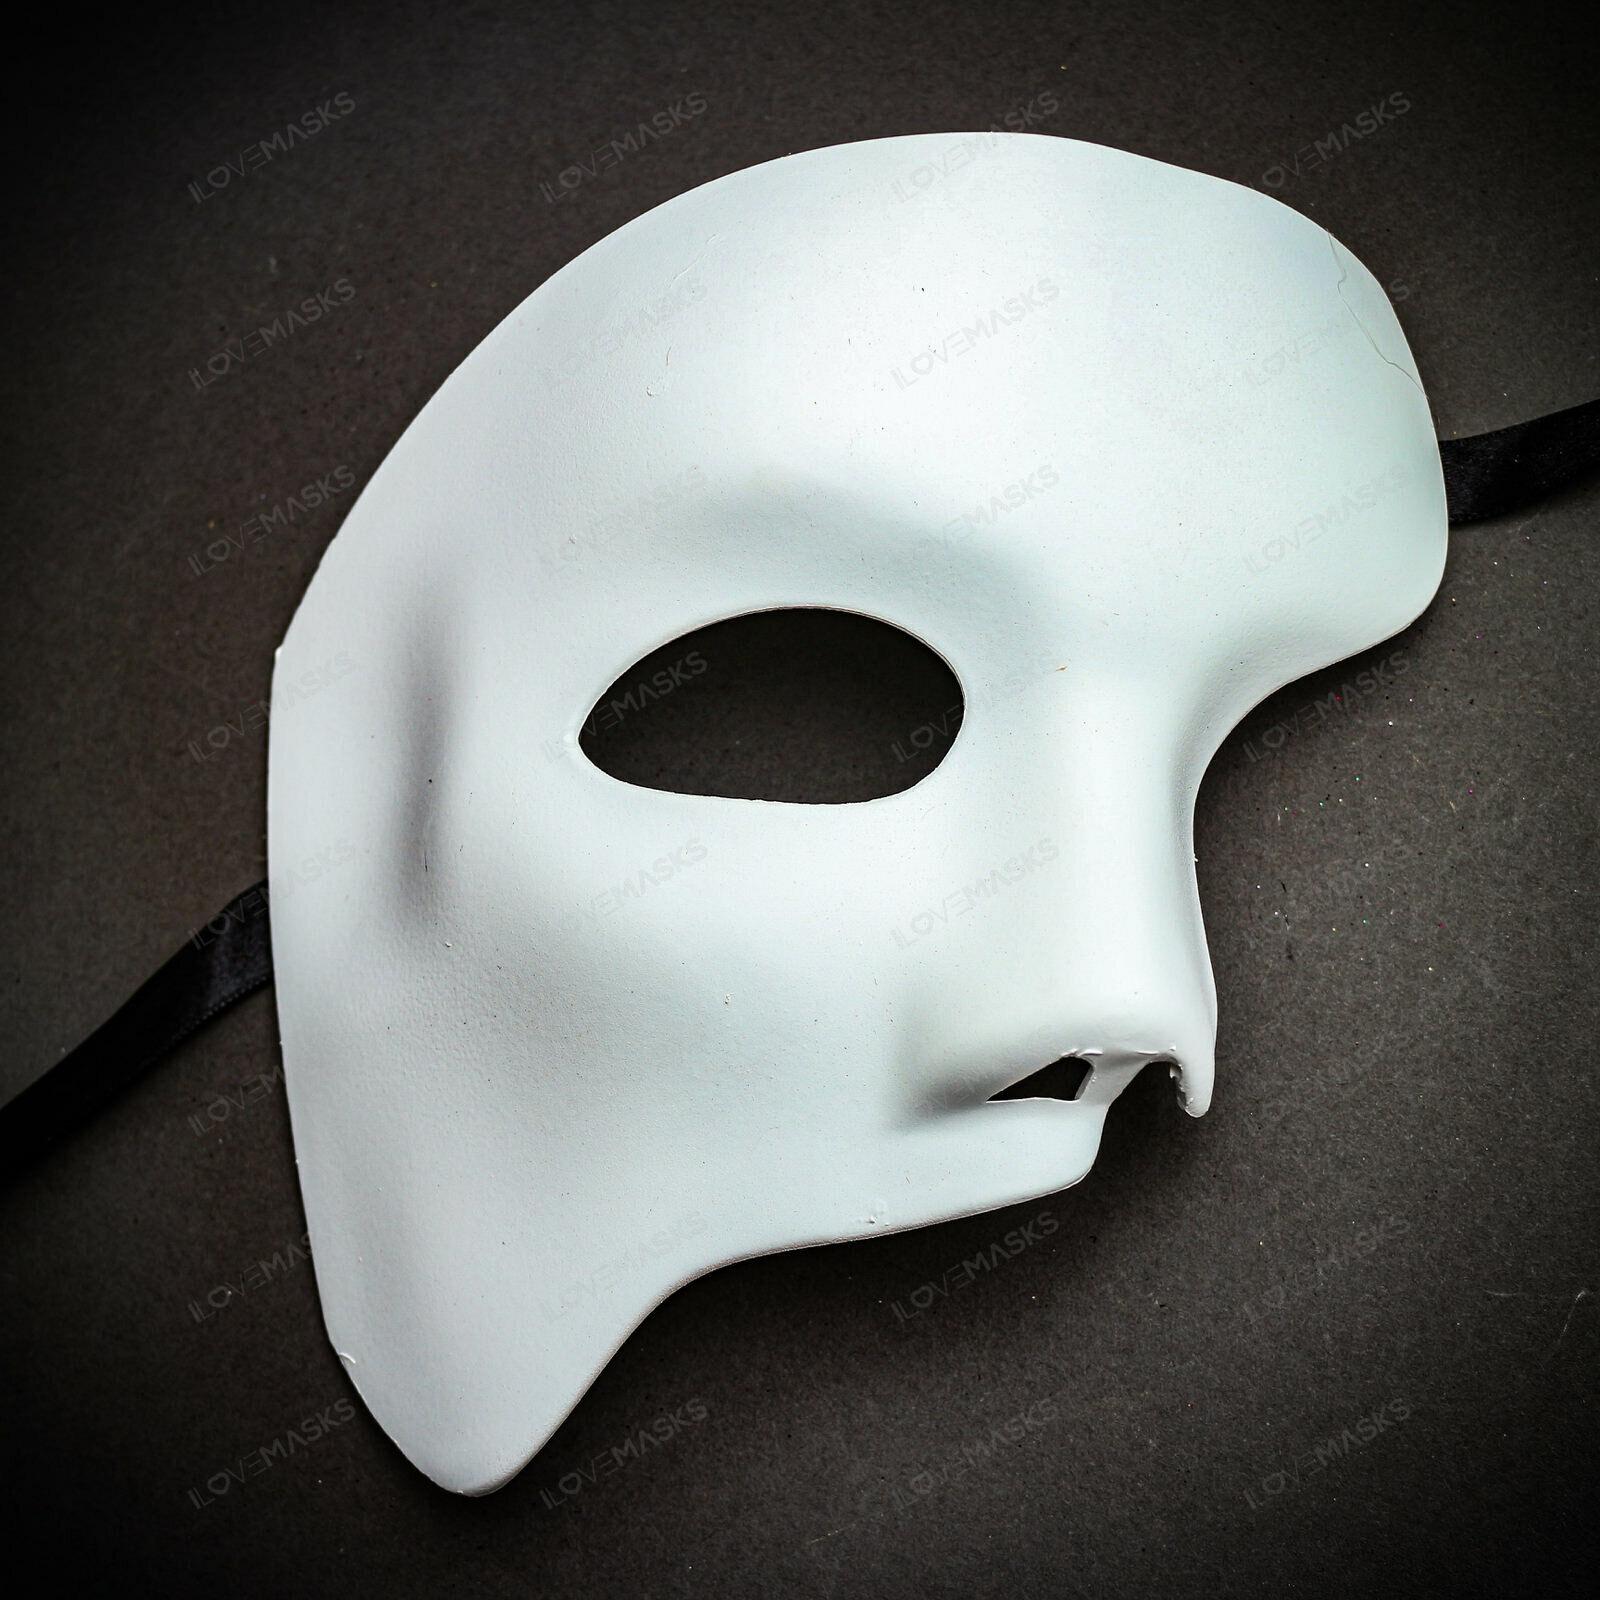 Phantom Of The Opera Diy Half Face Venetian Party Mask Nose White Unpainted Phantom Mask Mask Party Opera Mask